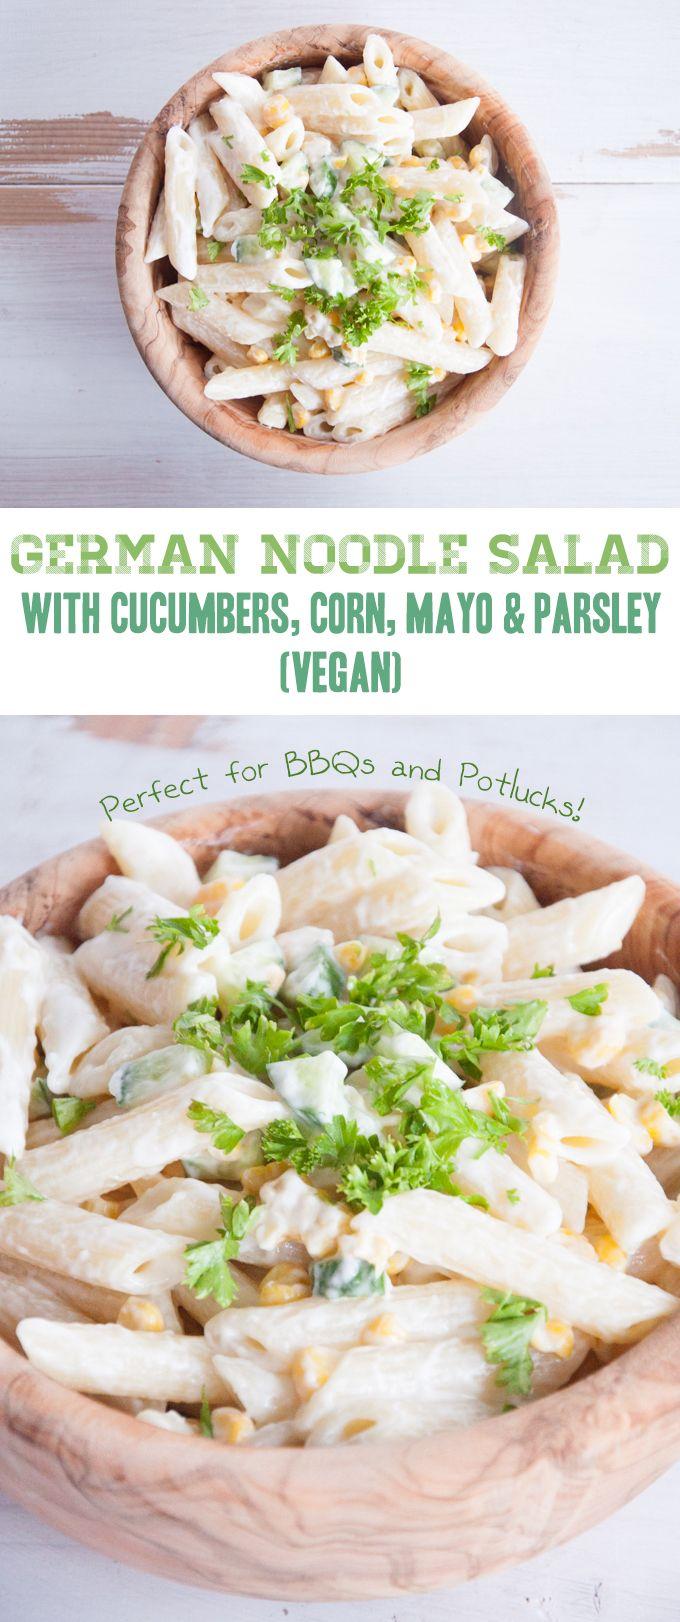 Vegan German Noodle Salad